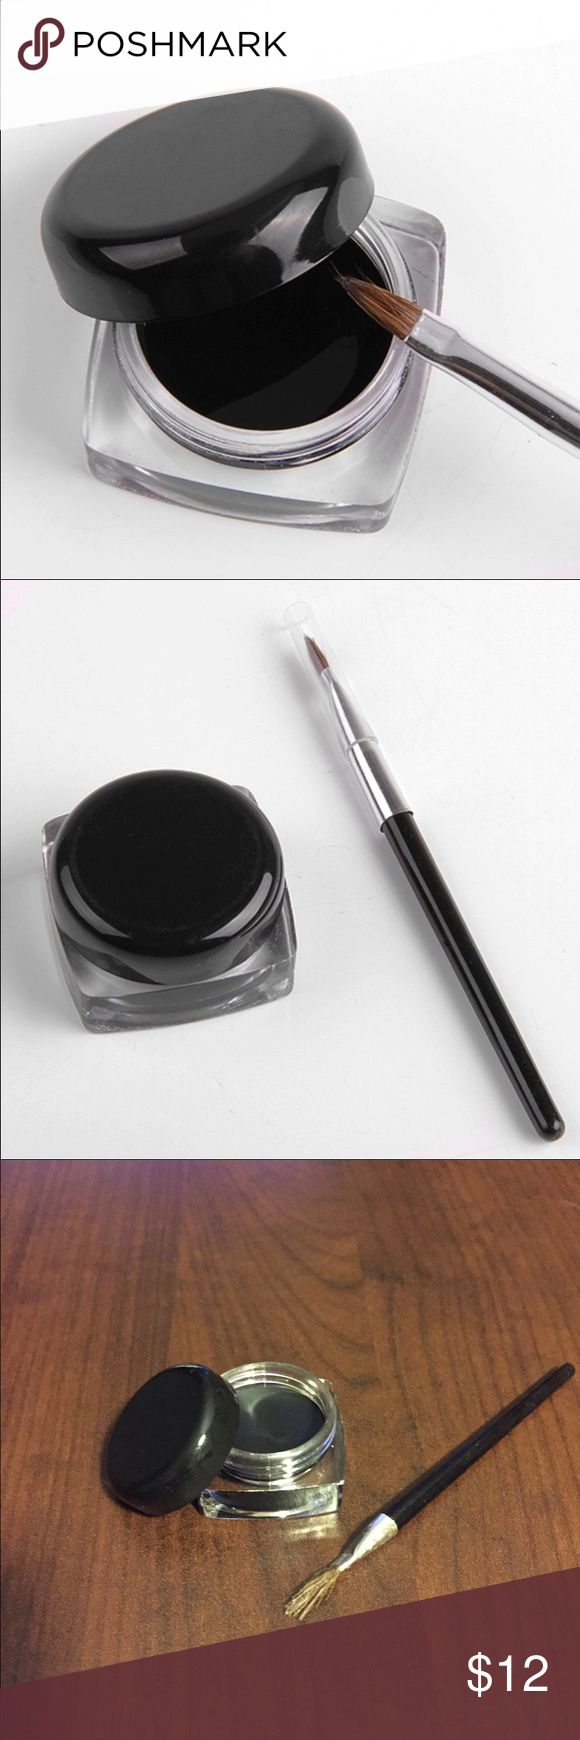 New Gel Eyeliner Brand new Black Gel Eyeliner. Waterproof and long-lasting formula. Comes with a brush! Non-branded. Bundle 3 items for 20% off! Makeup Eyeliner